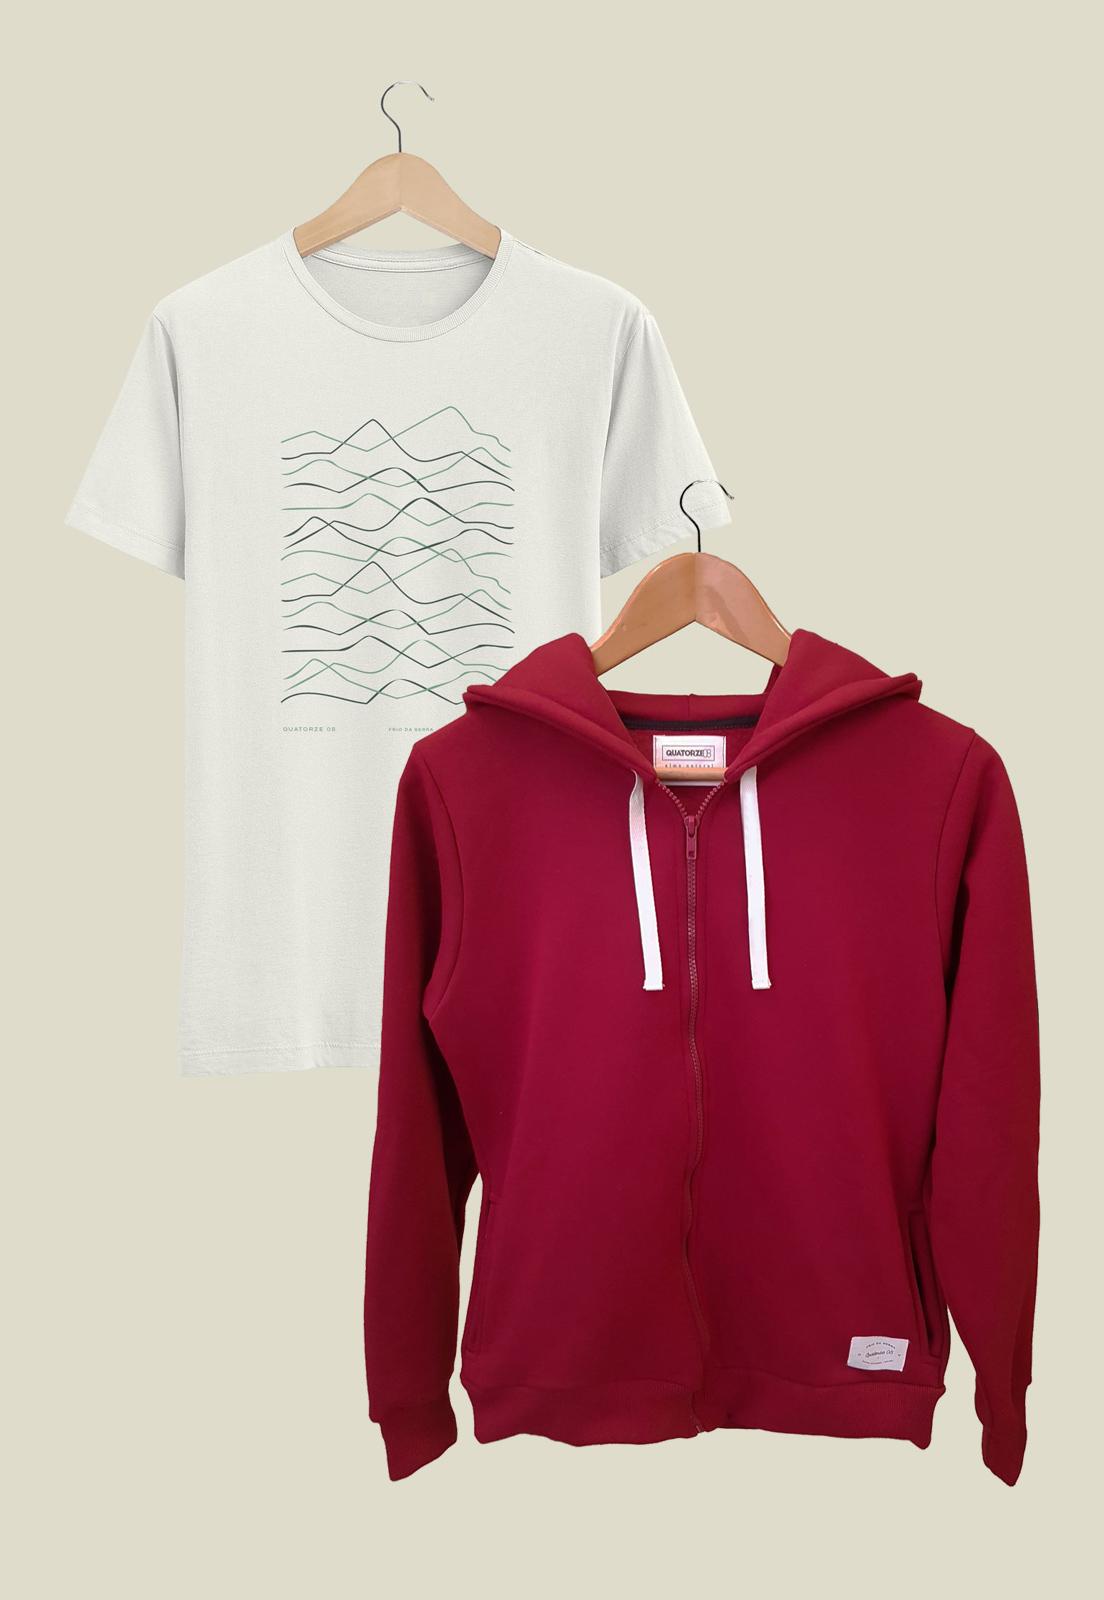 Caixa Presente Masculino Jaqueta Bordô + Camiseta Relevos Off-White